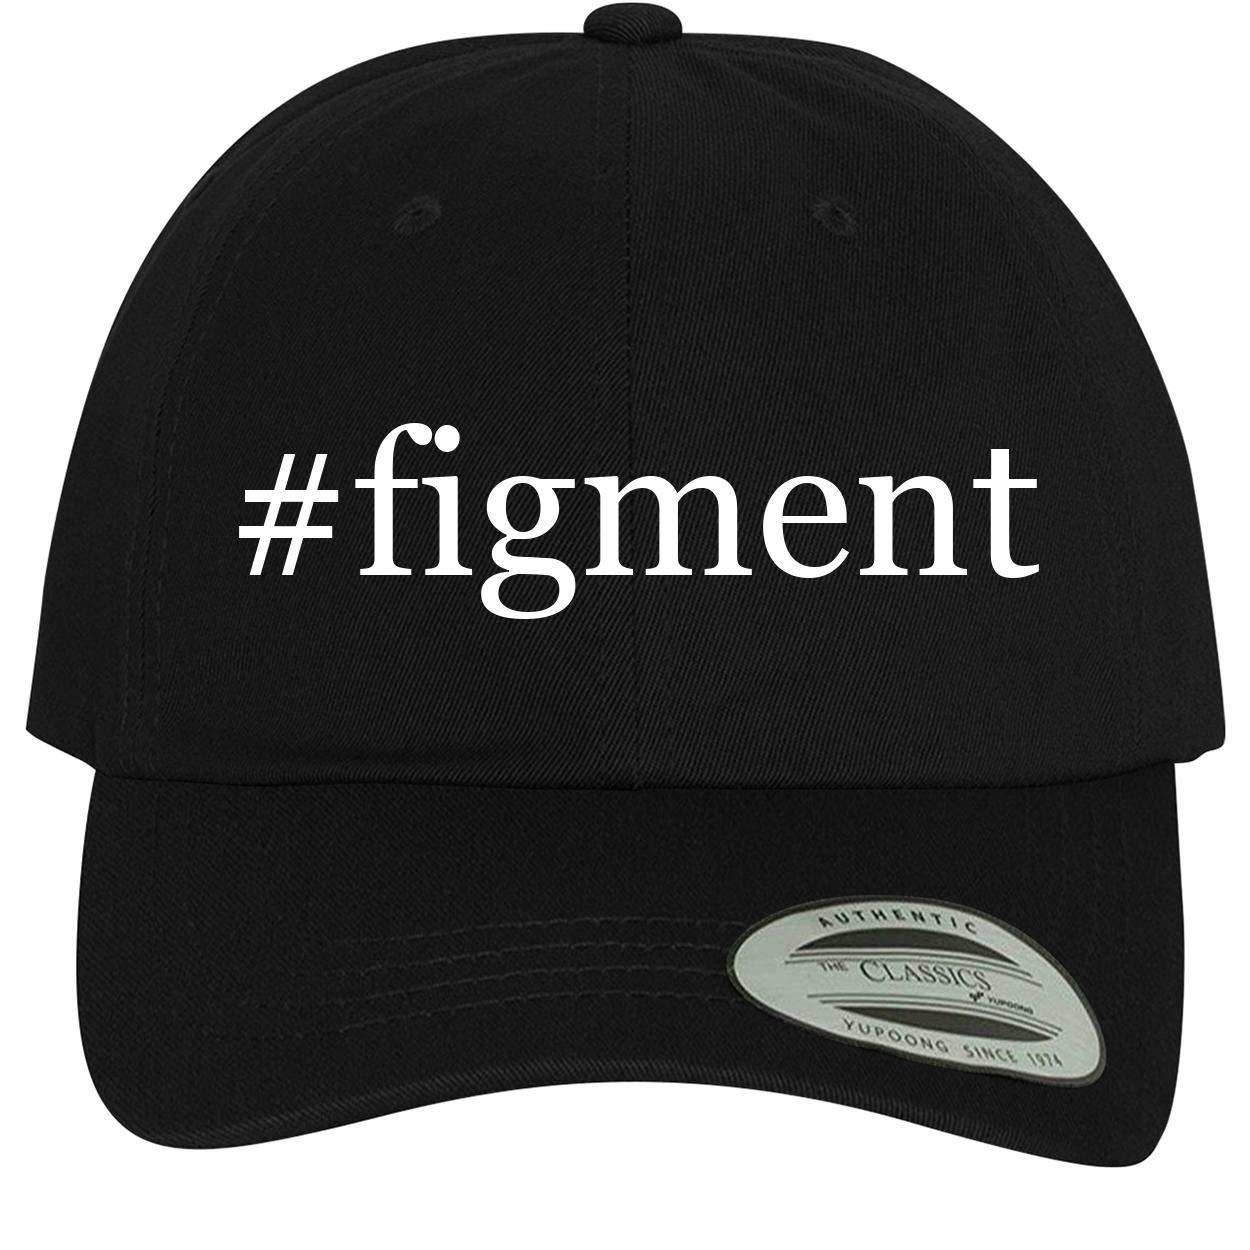 BH Cool Designs #Figment Comfortable Dad Hat Baseball Cap